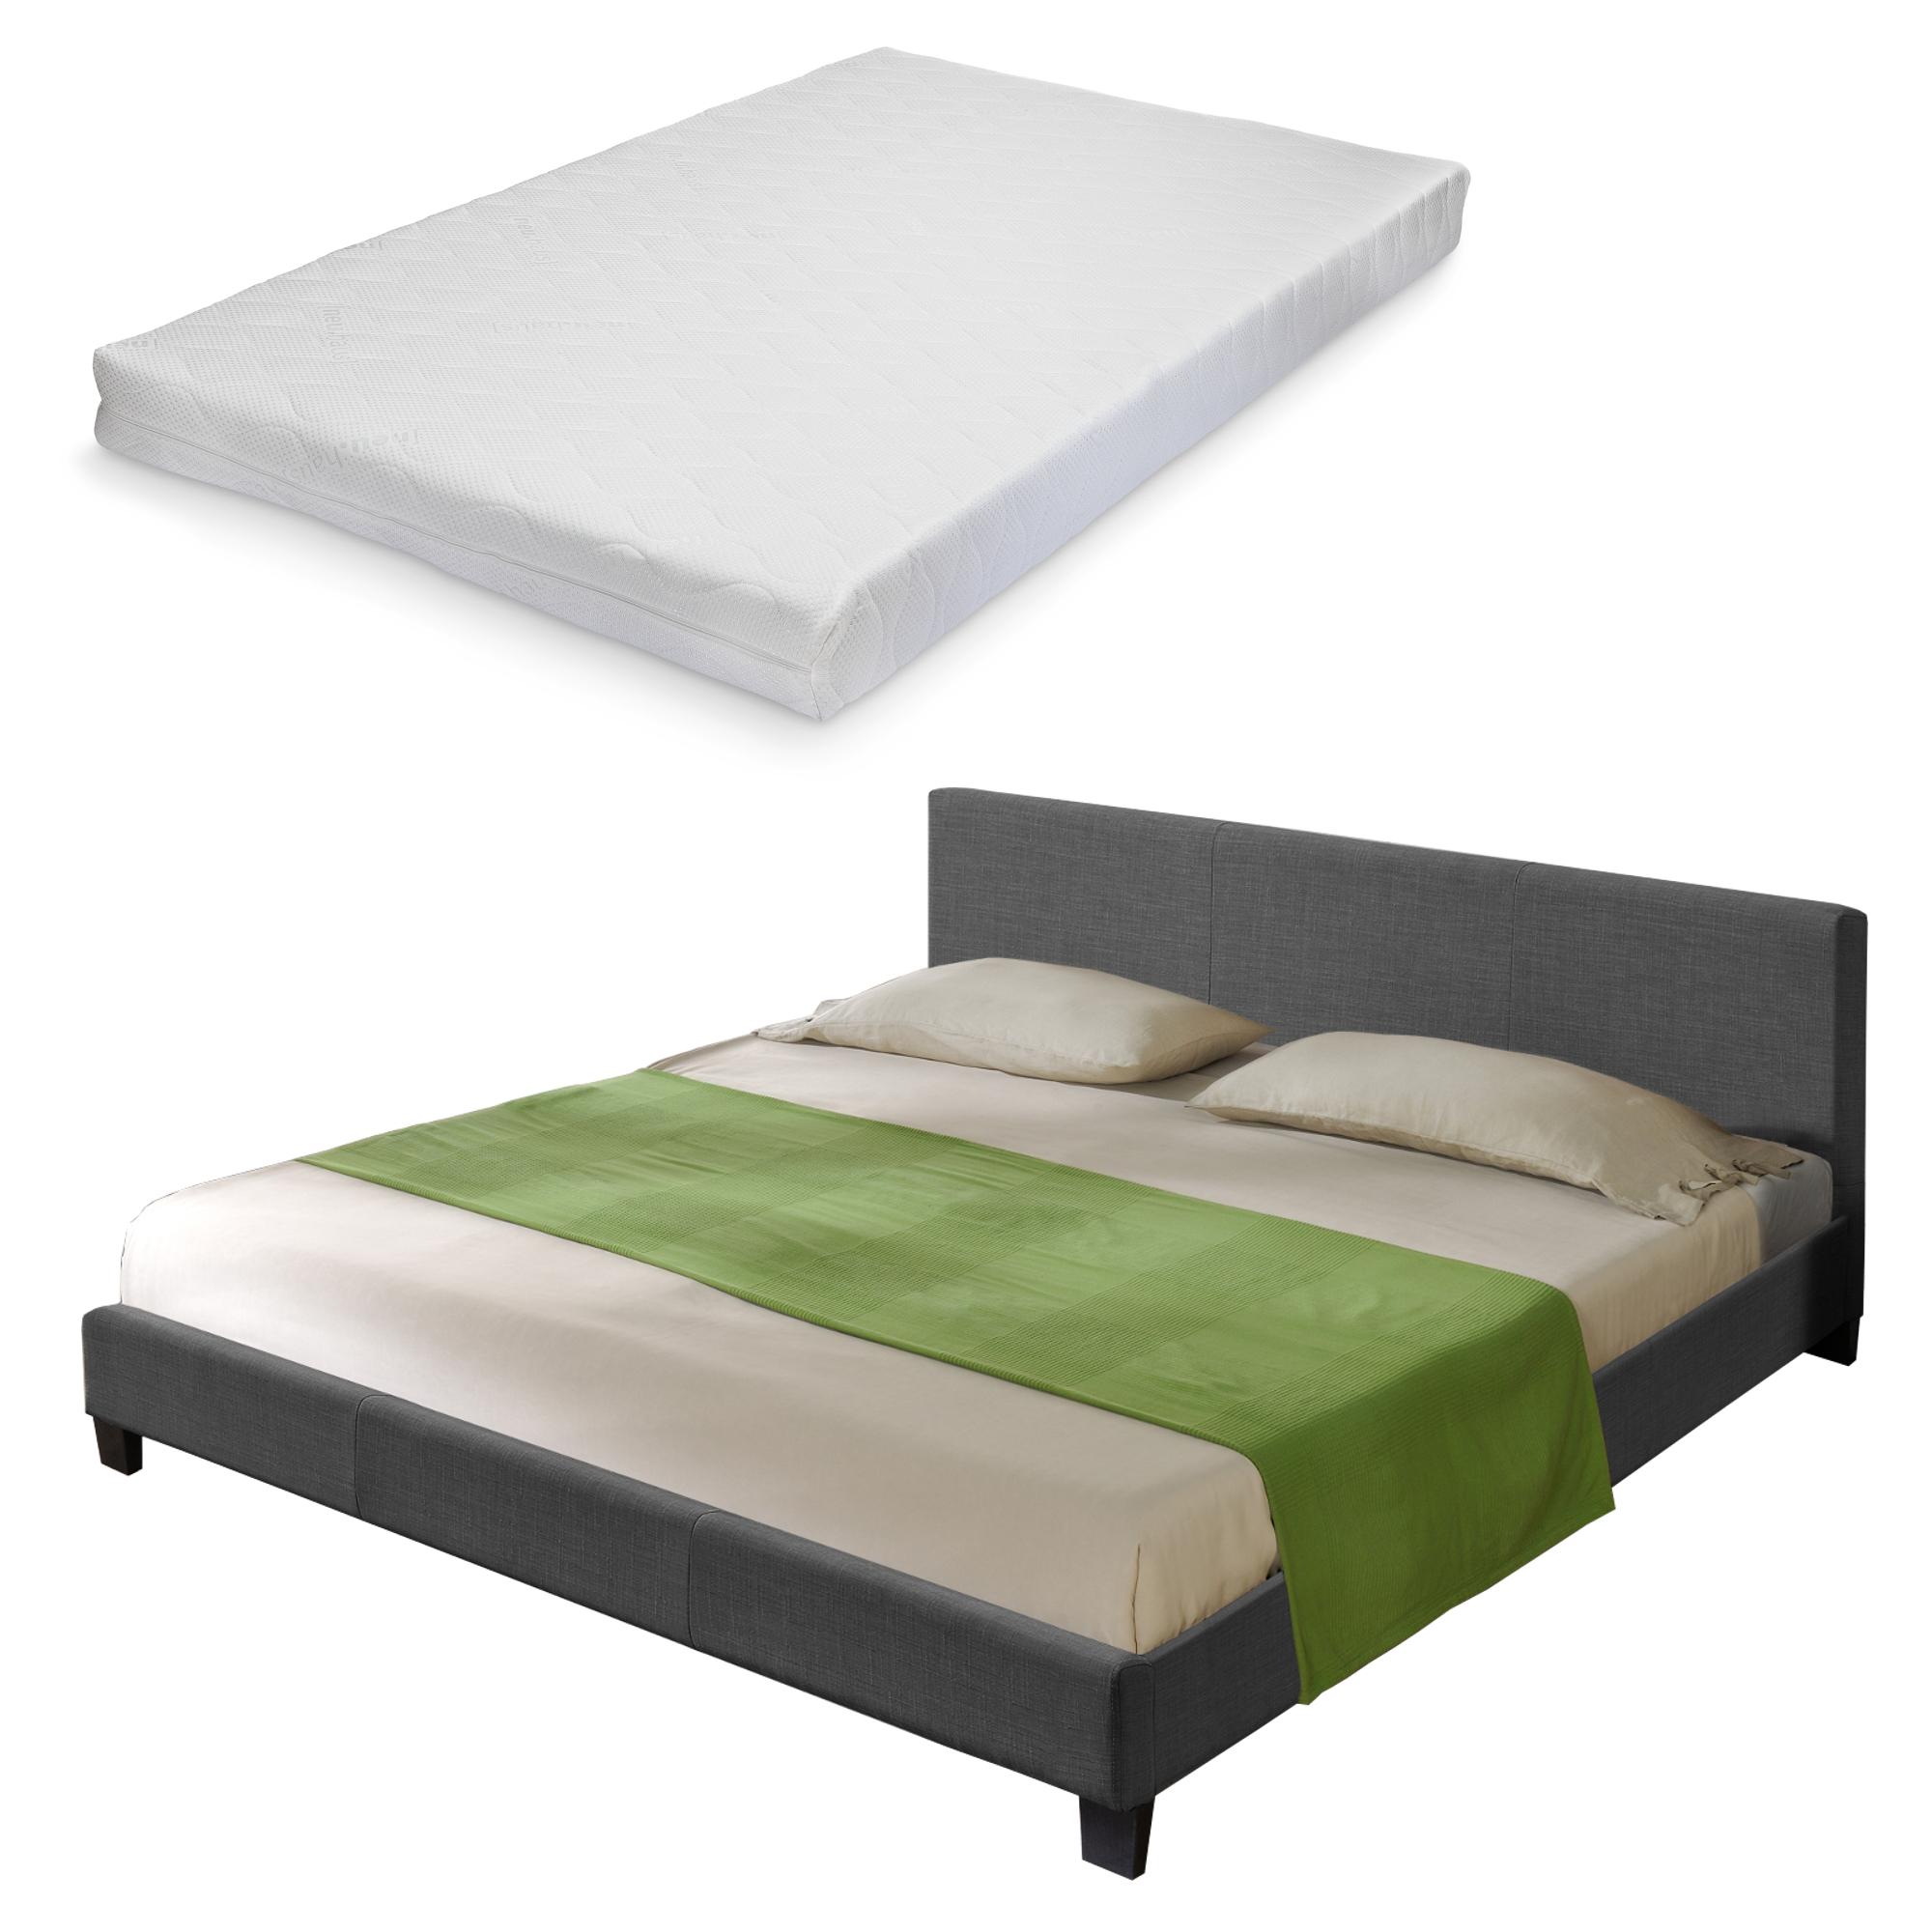 corium grand lit matelas sommier tapissier 140x200cm sommier lattes tissu ebay. Black Bedroom Furniture Sets. Home Design Ideas